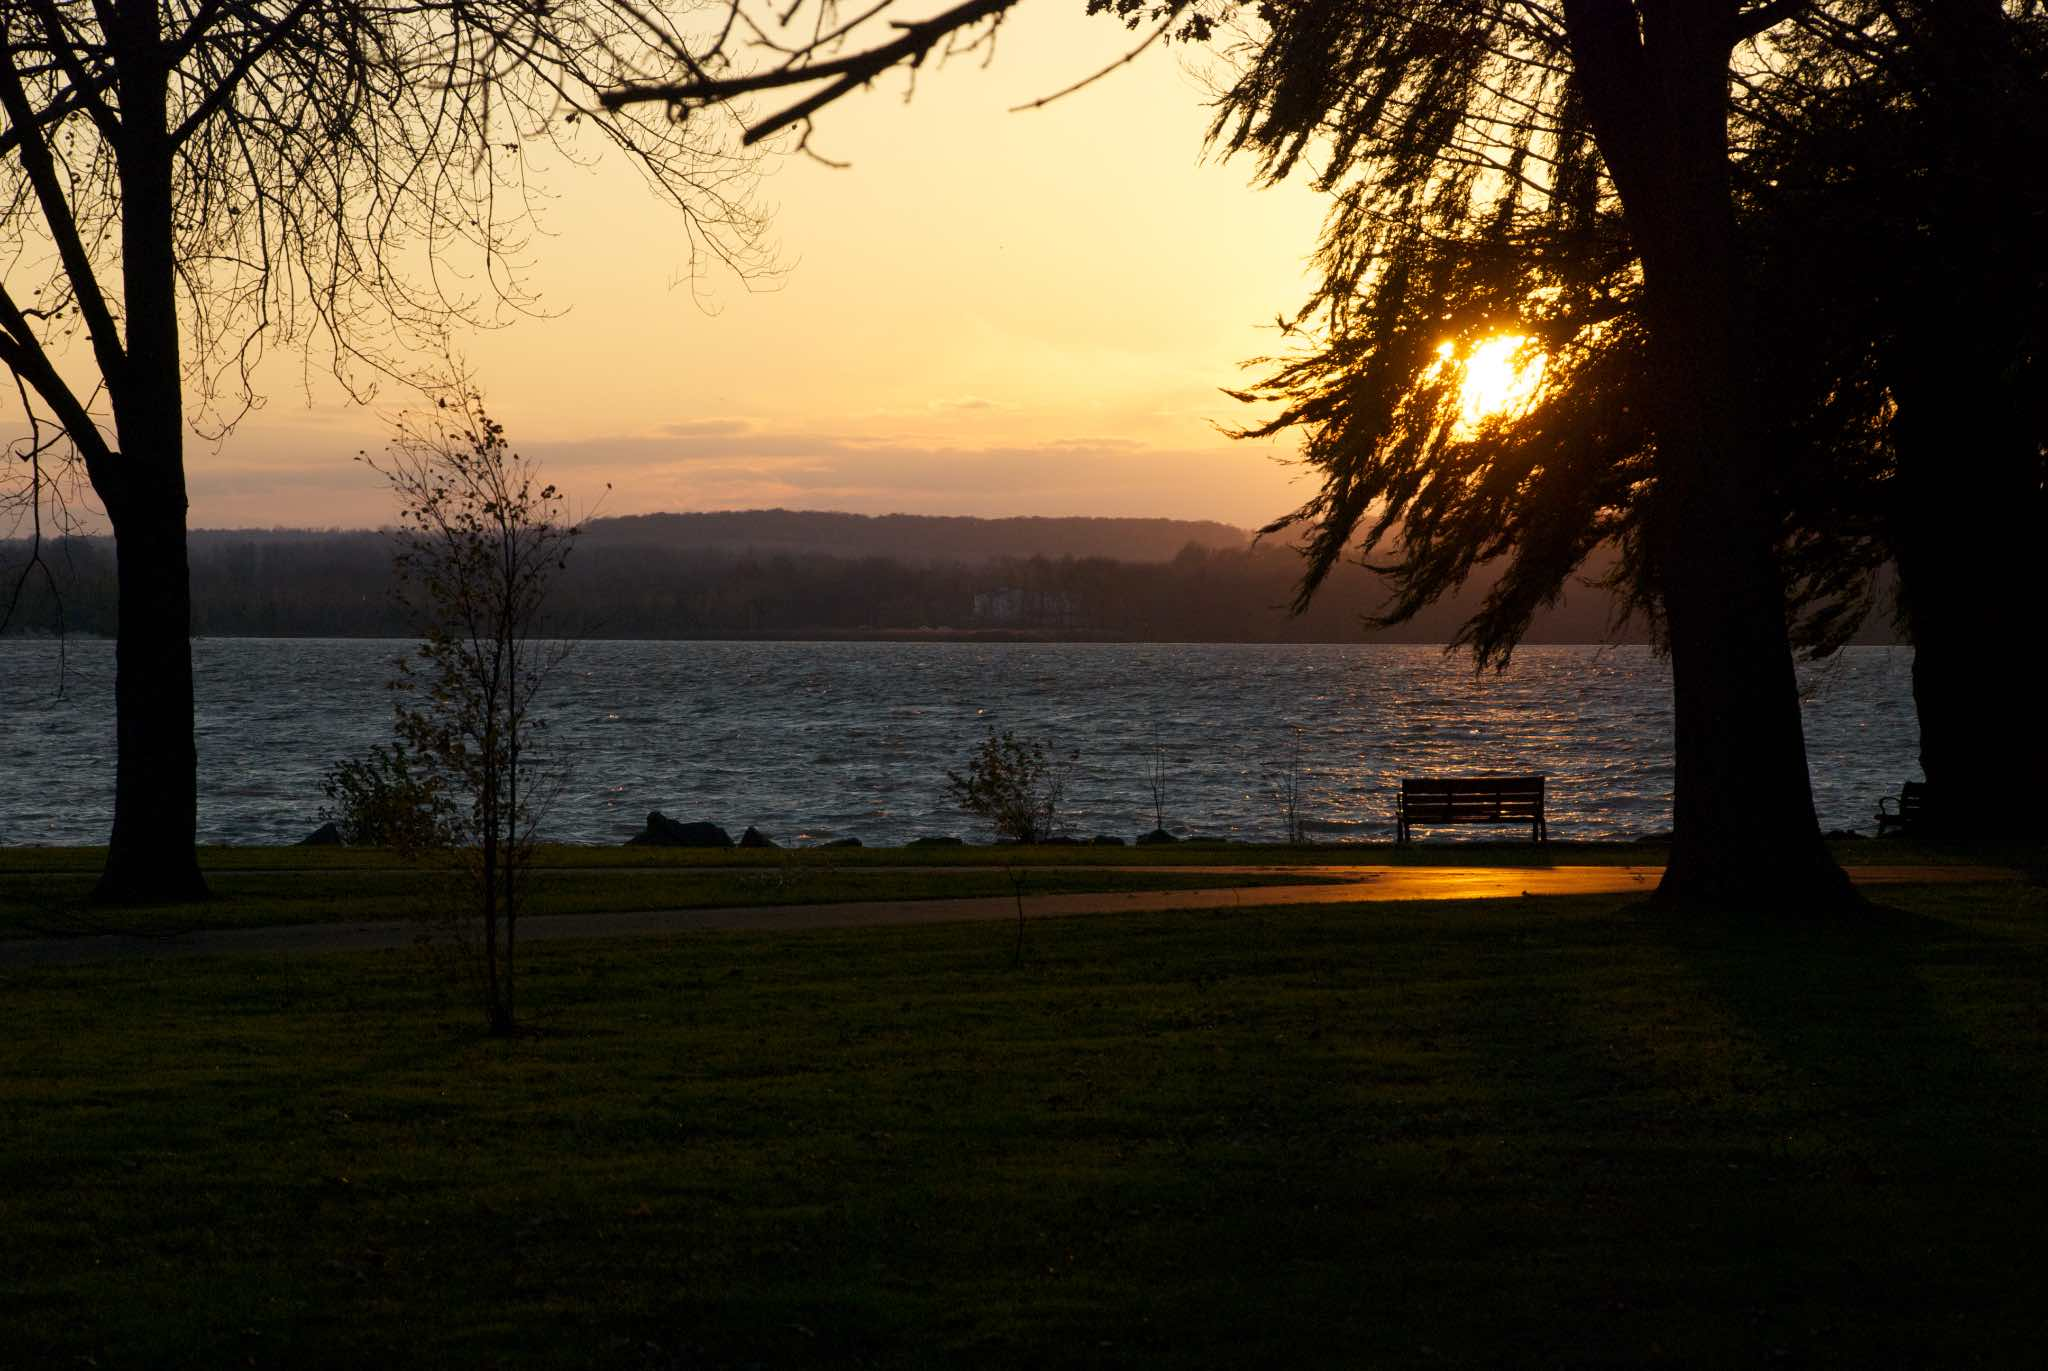 Sunset at Onandaga